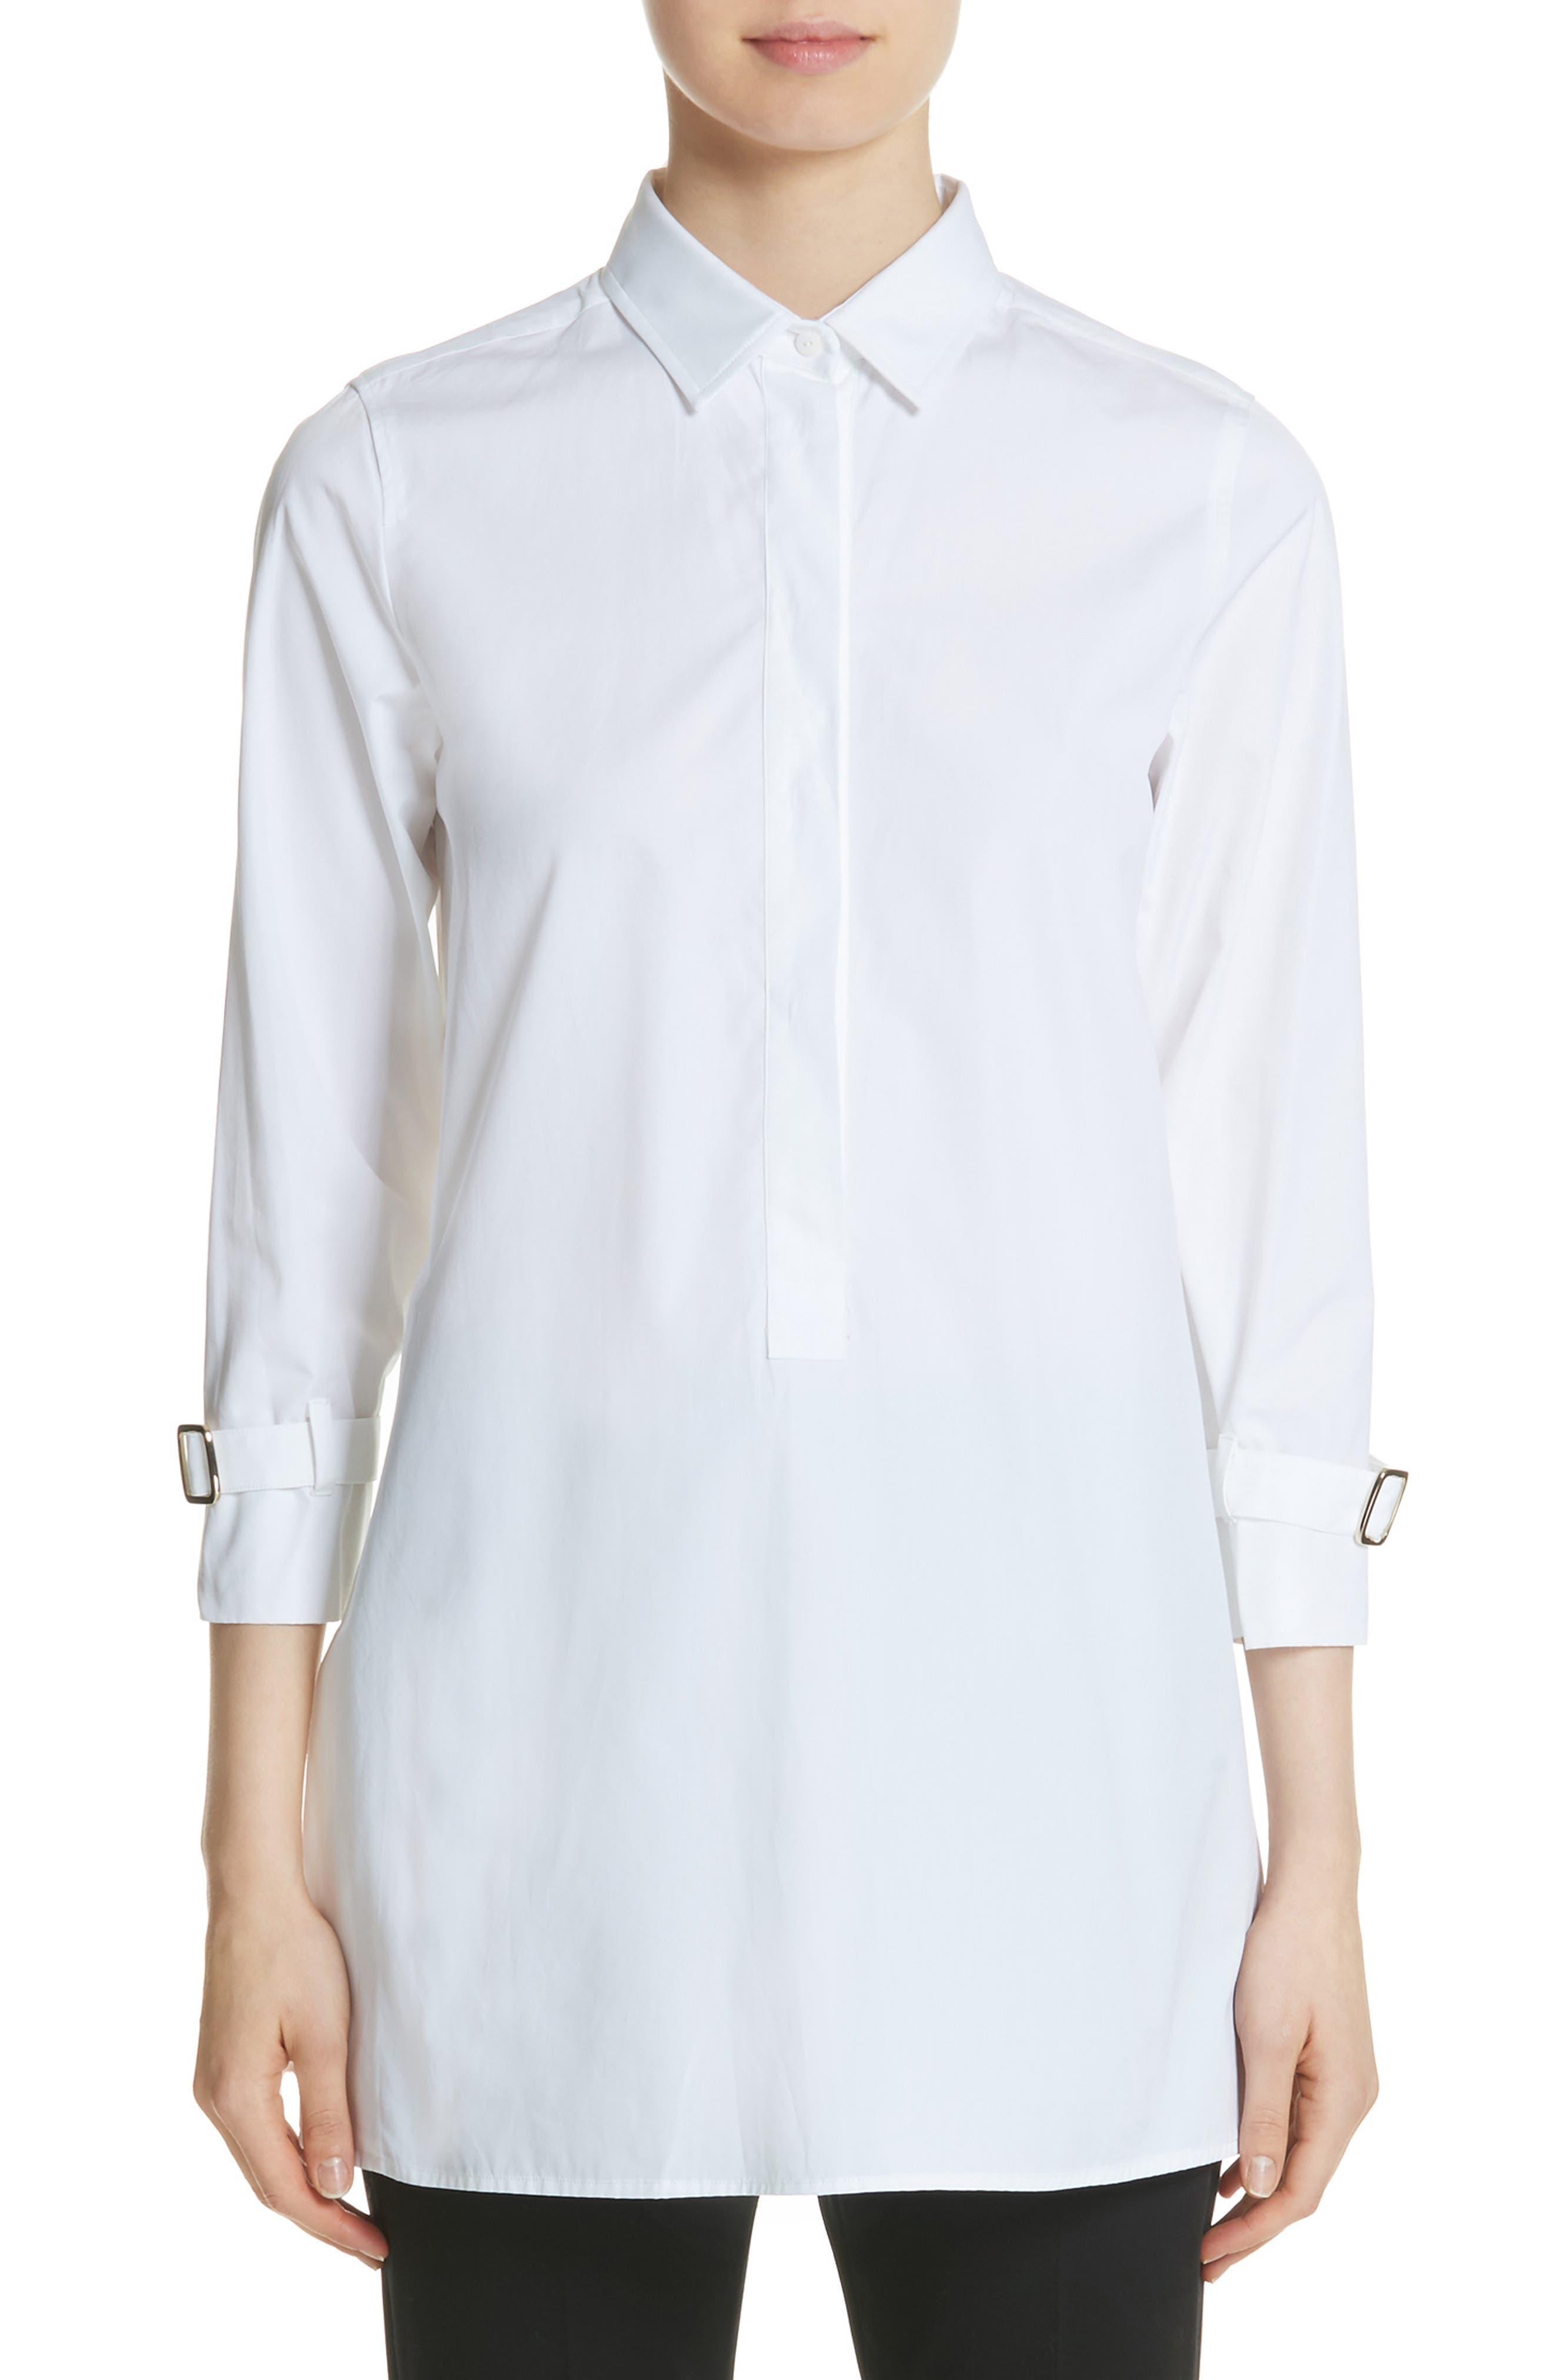 Max Mara Disegno Cotton Shirt